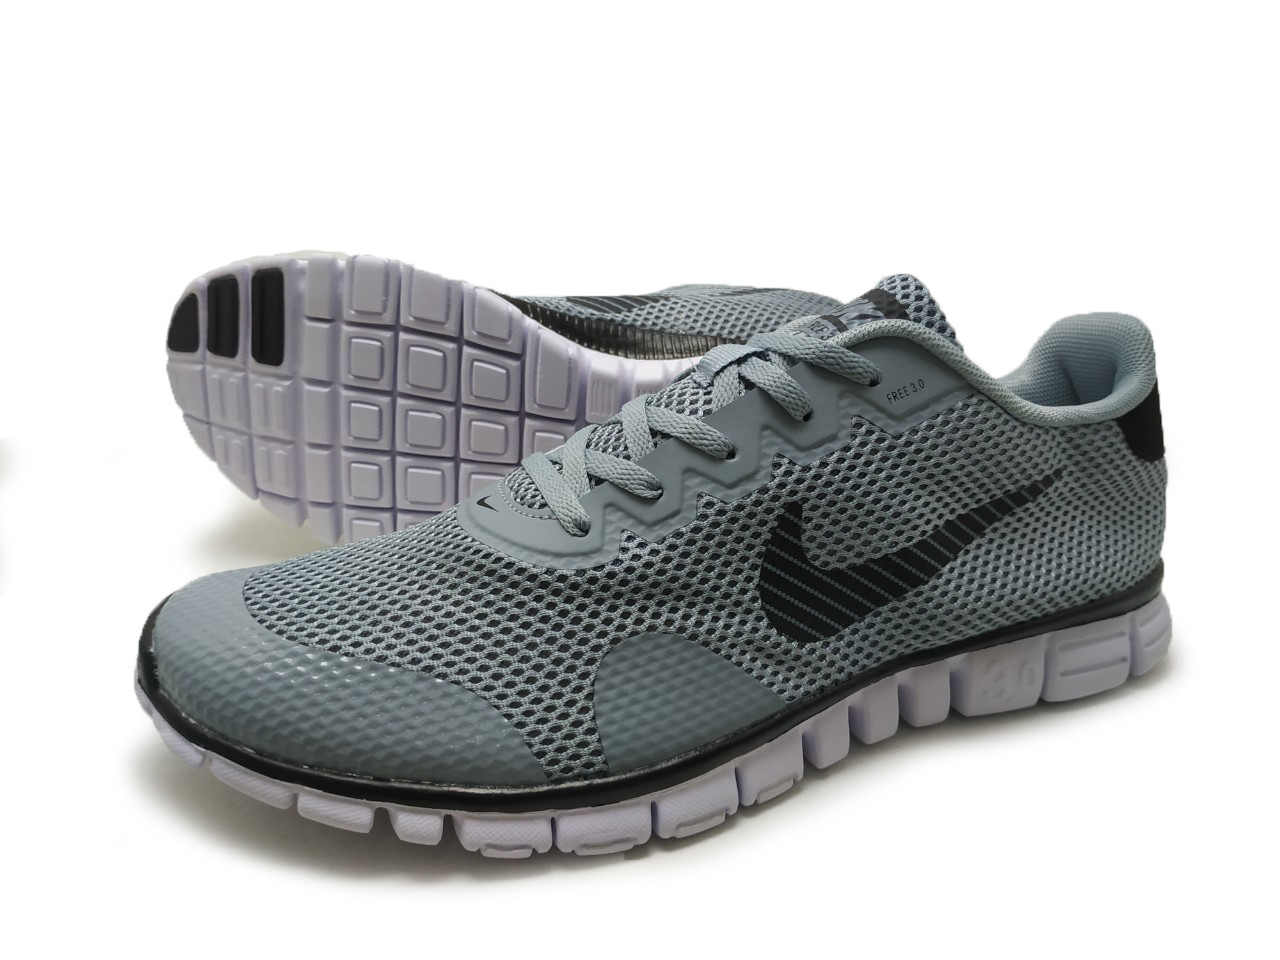 Мужские кроссовки NIKE FREE RUN 3.0 New